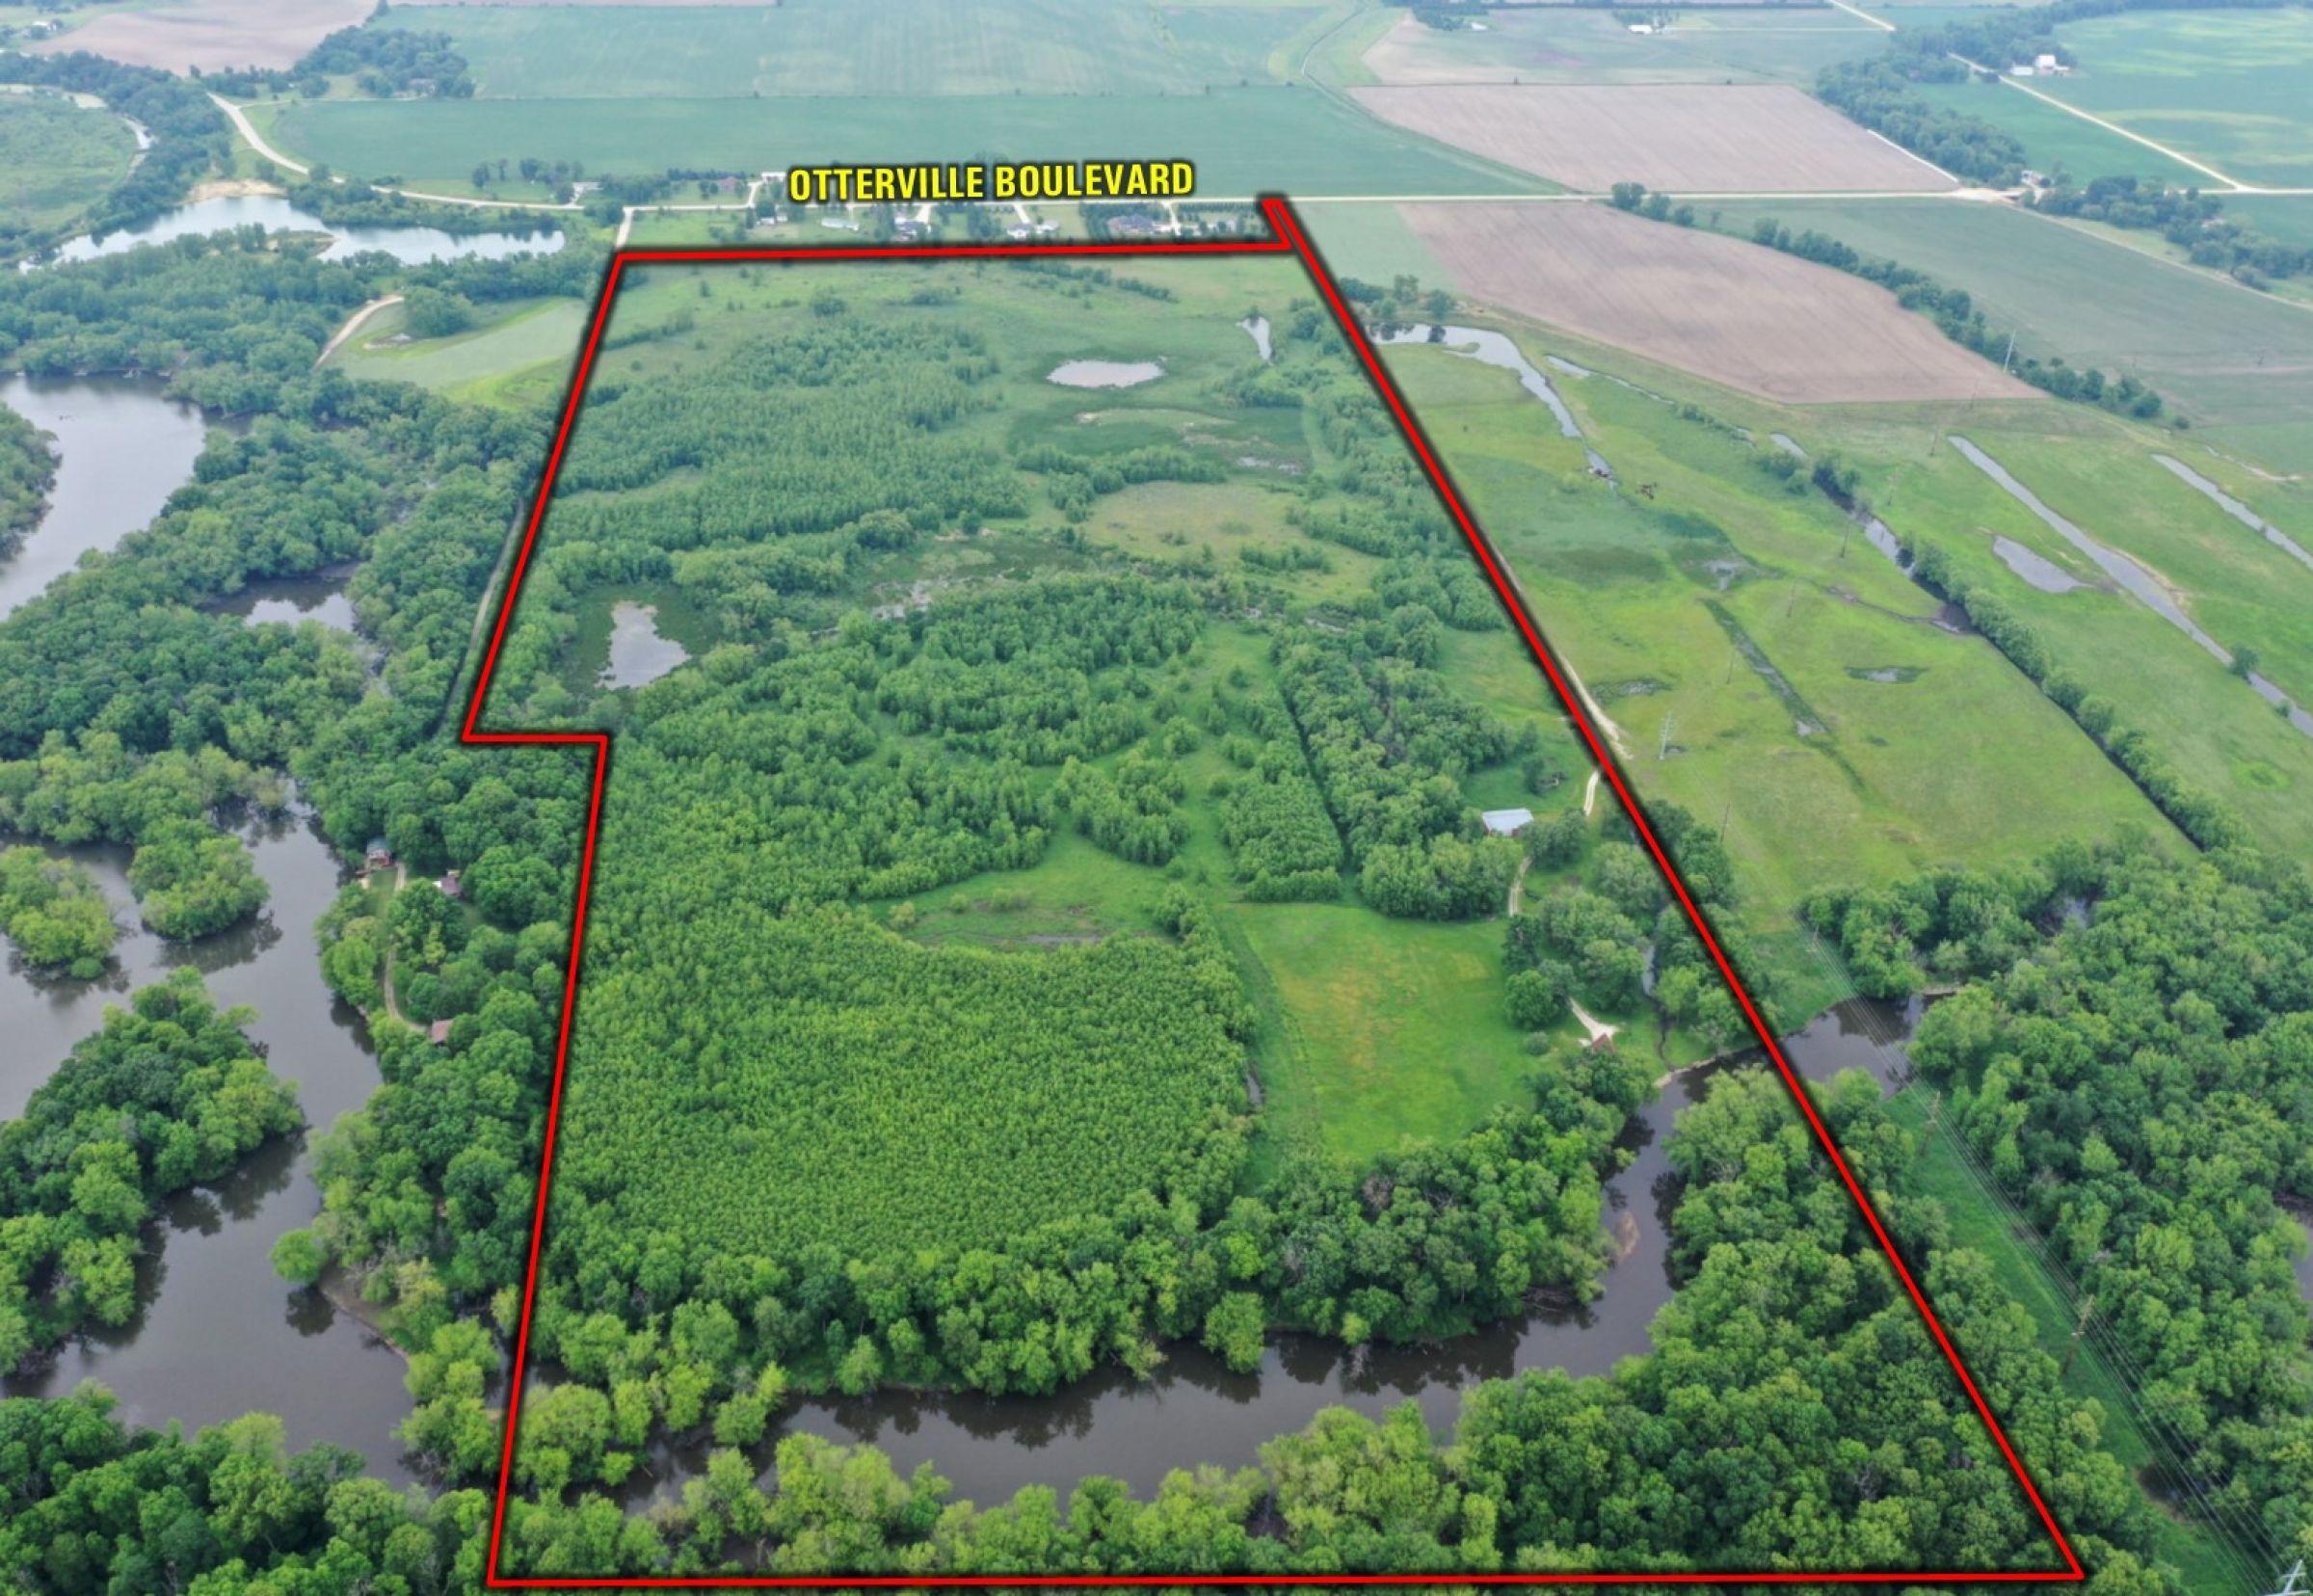 Aerial Image Looking North